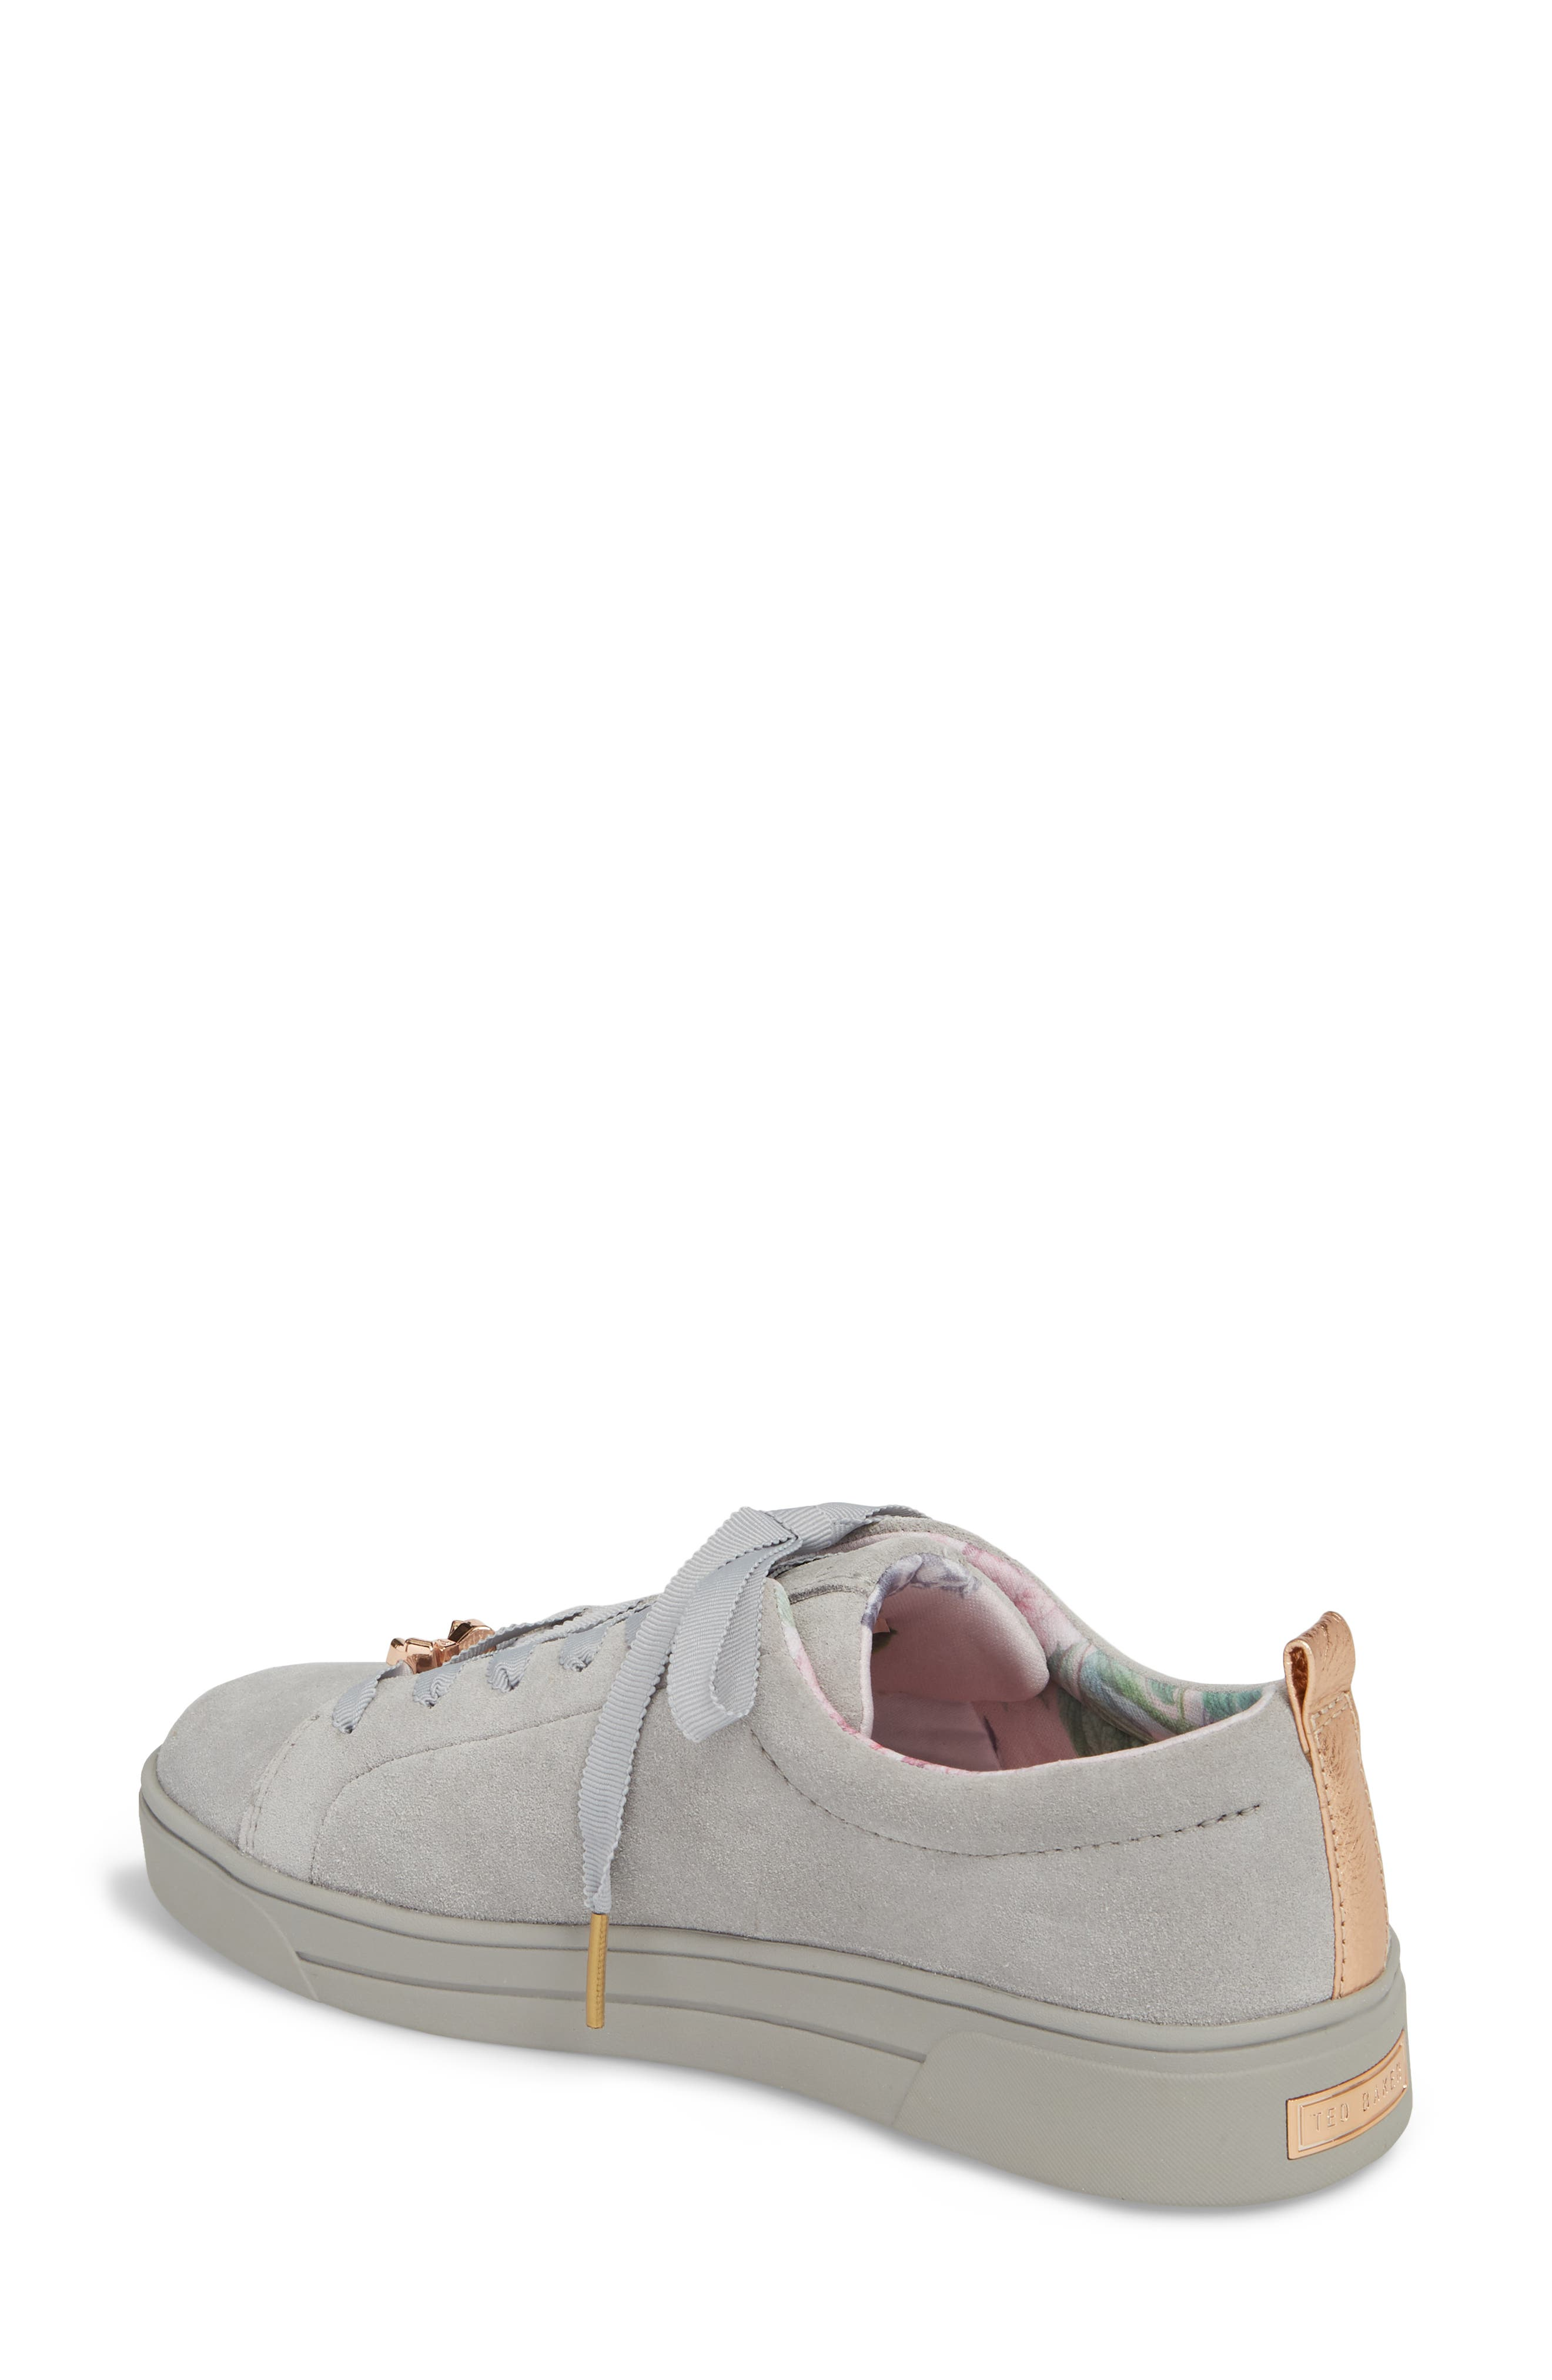 Kelleis Sneaker,                             Alternate thumbnail 2, color,                             LIGHT GREY SUEDE